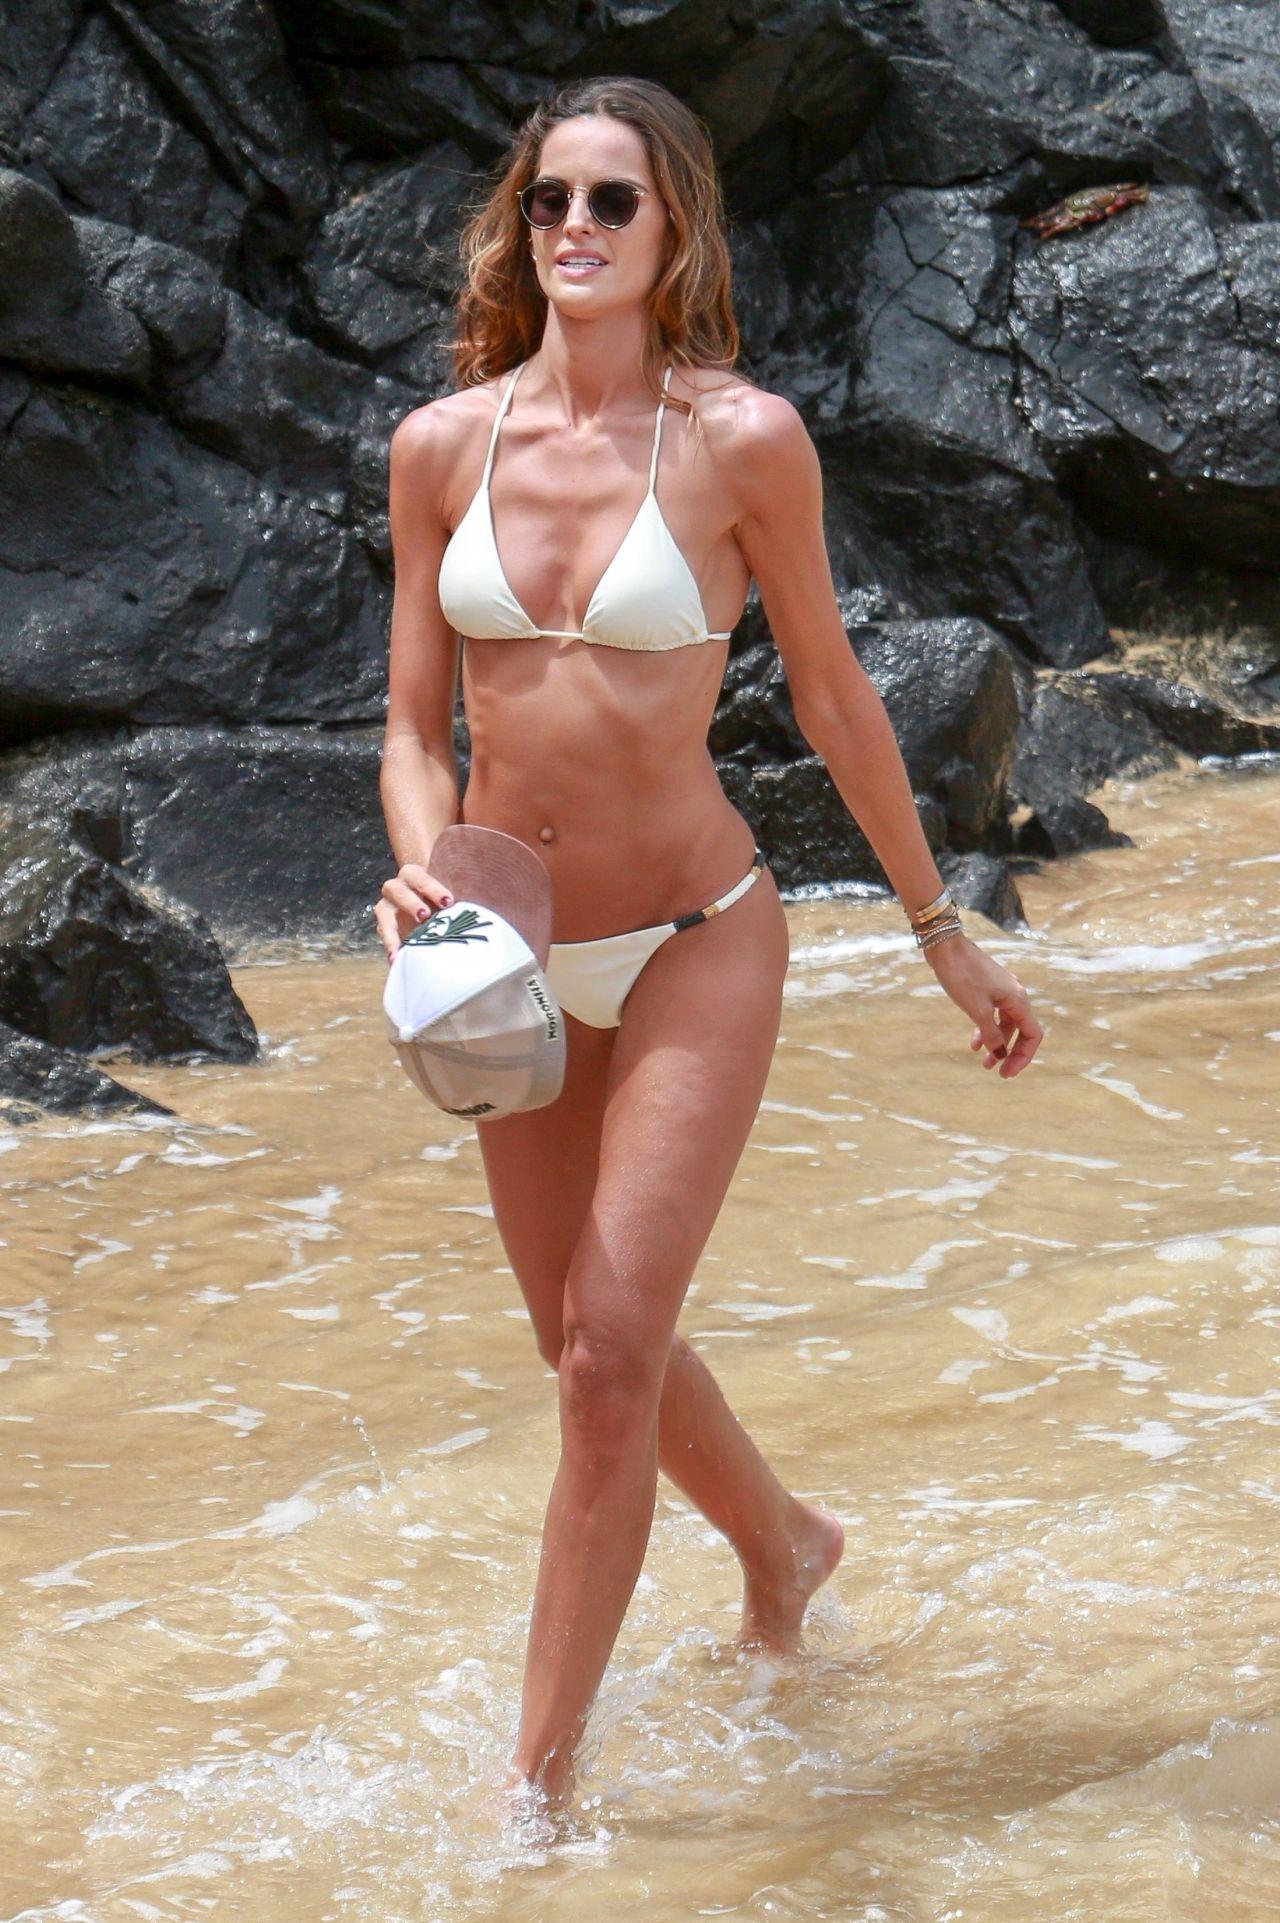 Goulart De Noronha Izabel Bikini White Fernando In Beach A deEBWCxorQ